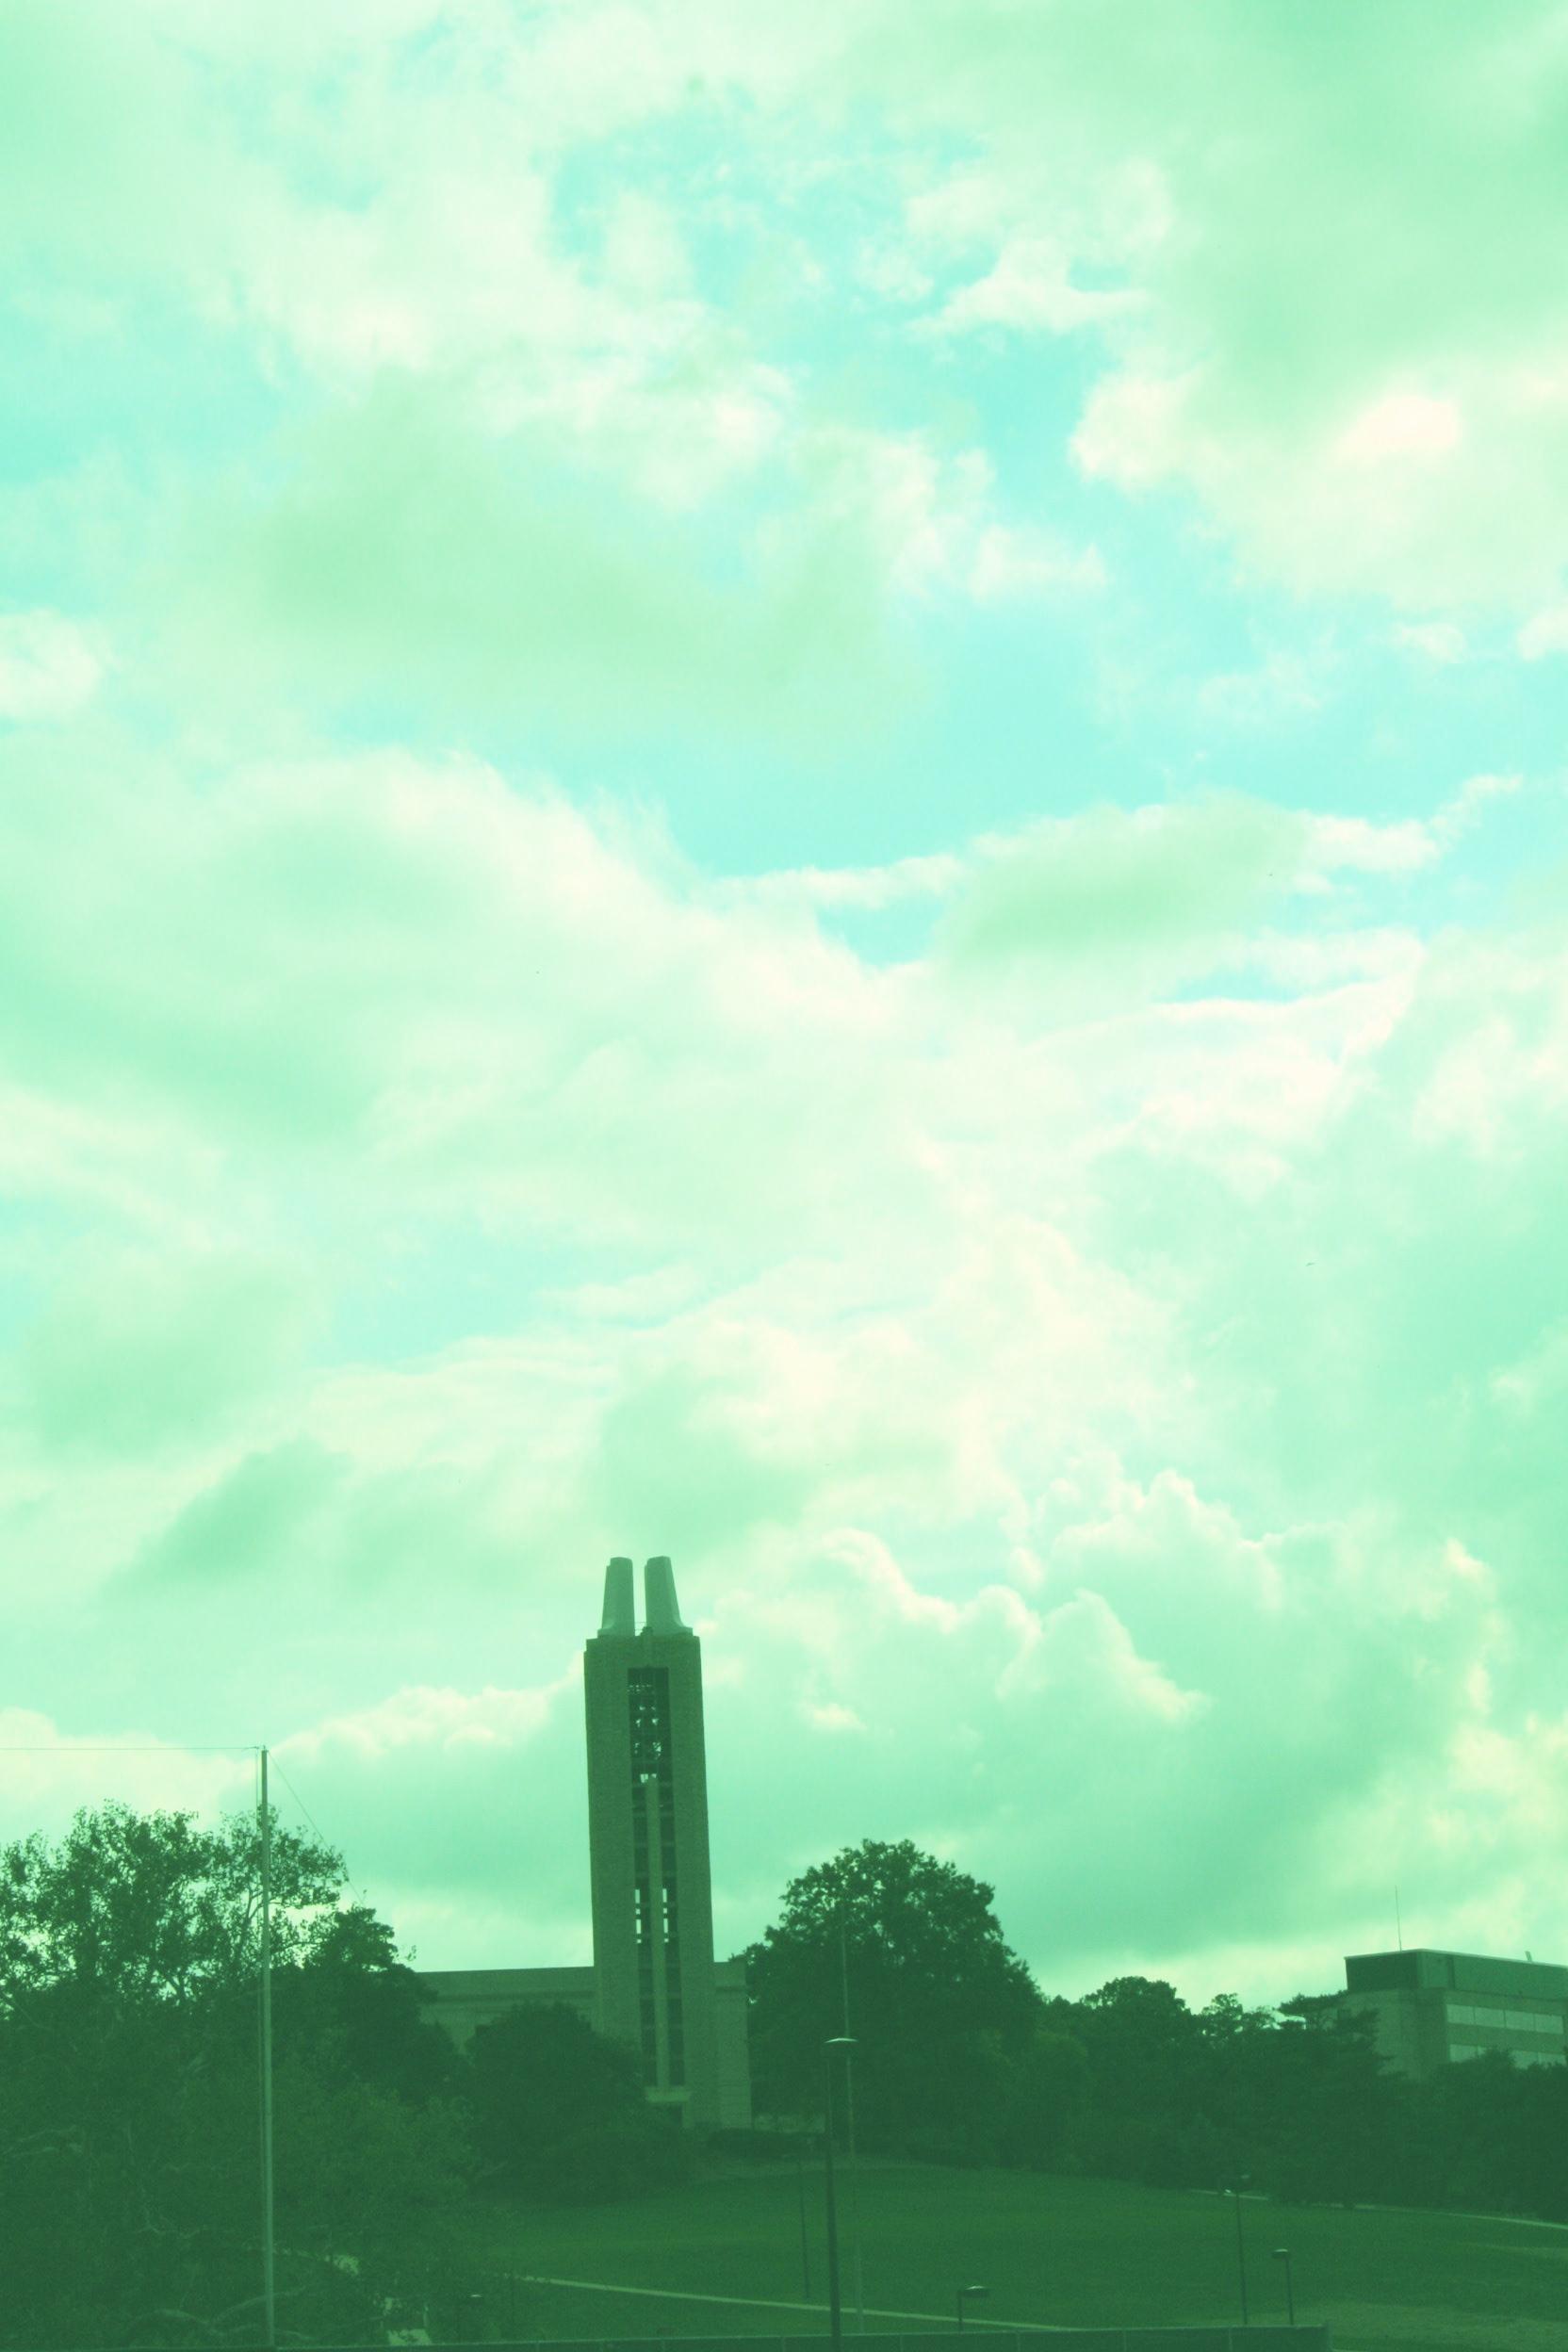 campanile.